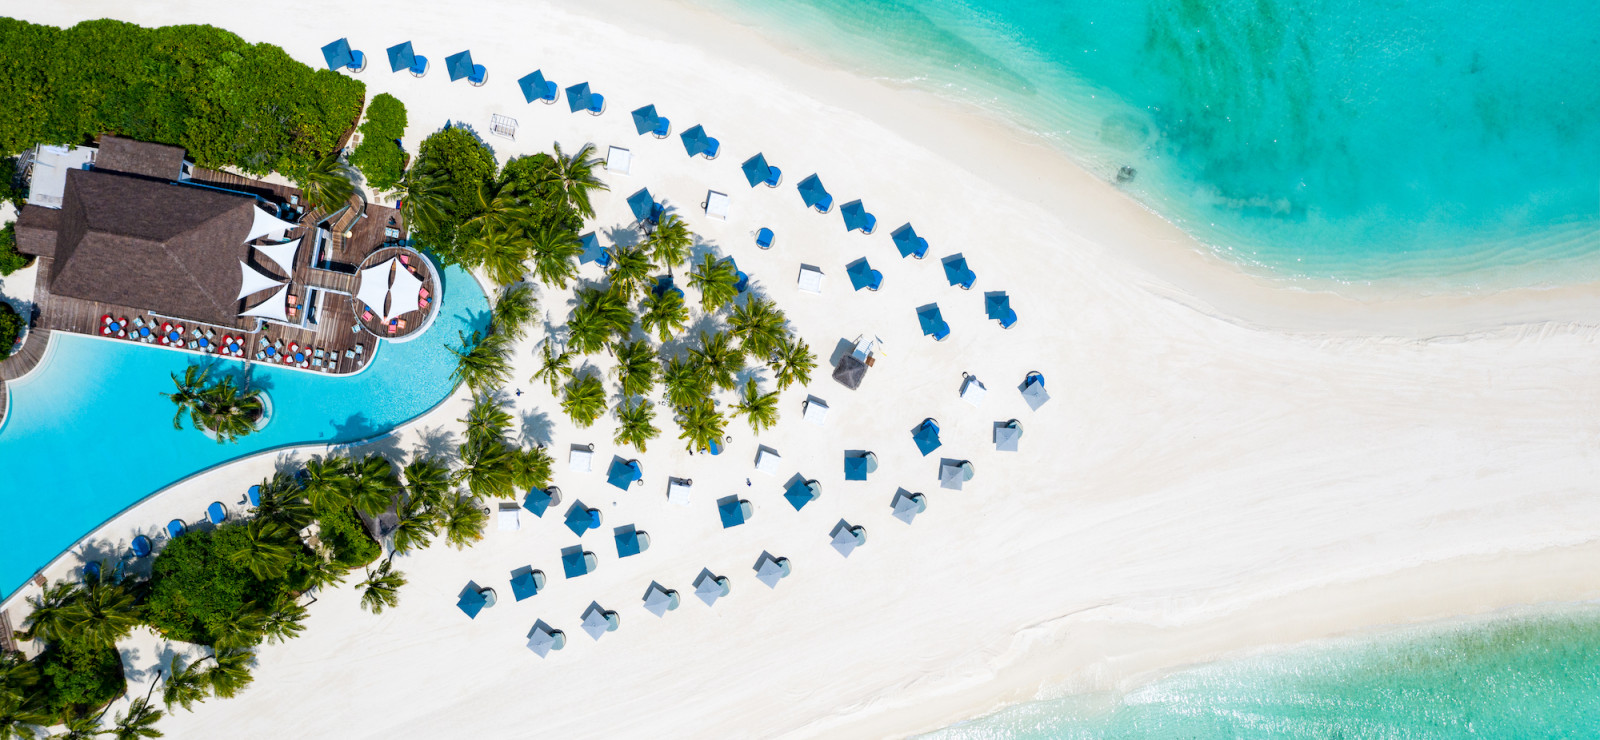 Finolhu Baa Atoll Maldives Bilder   Bild 1